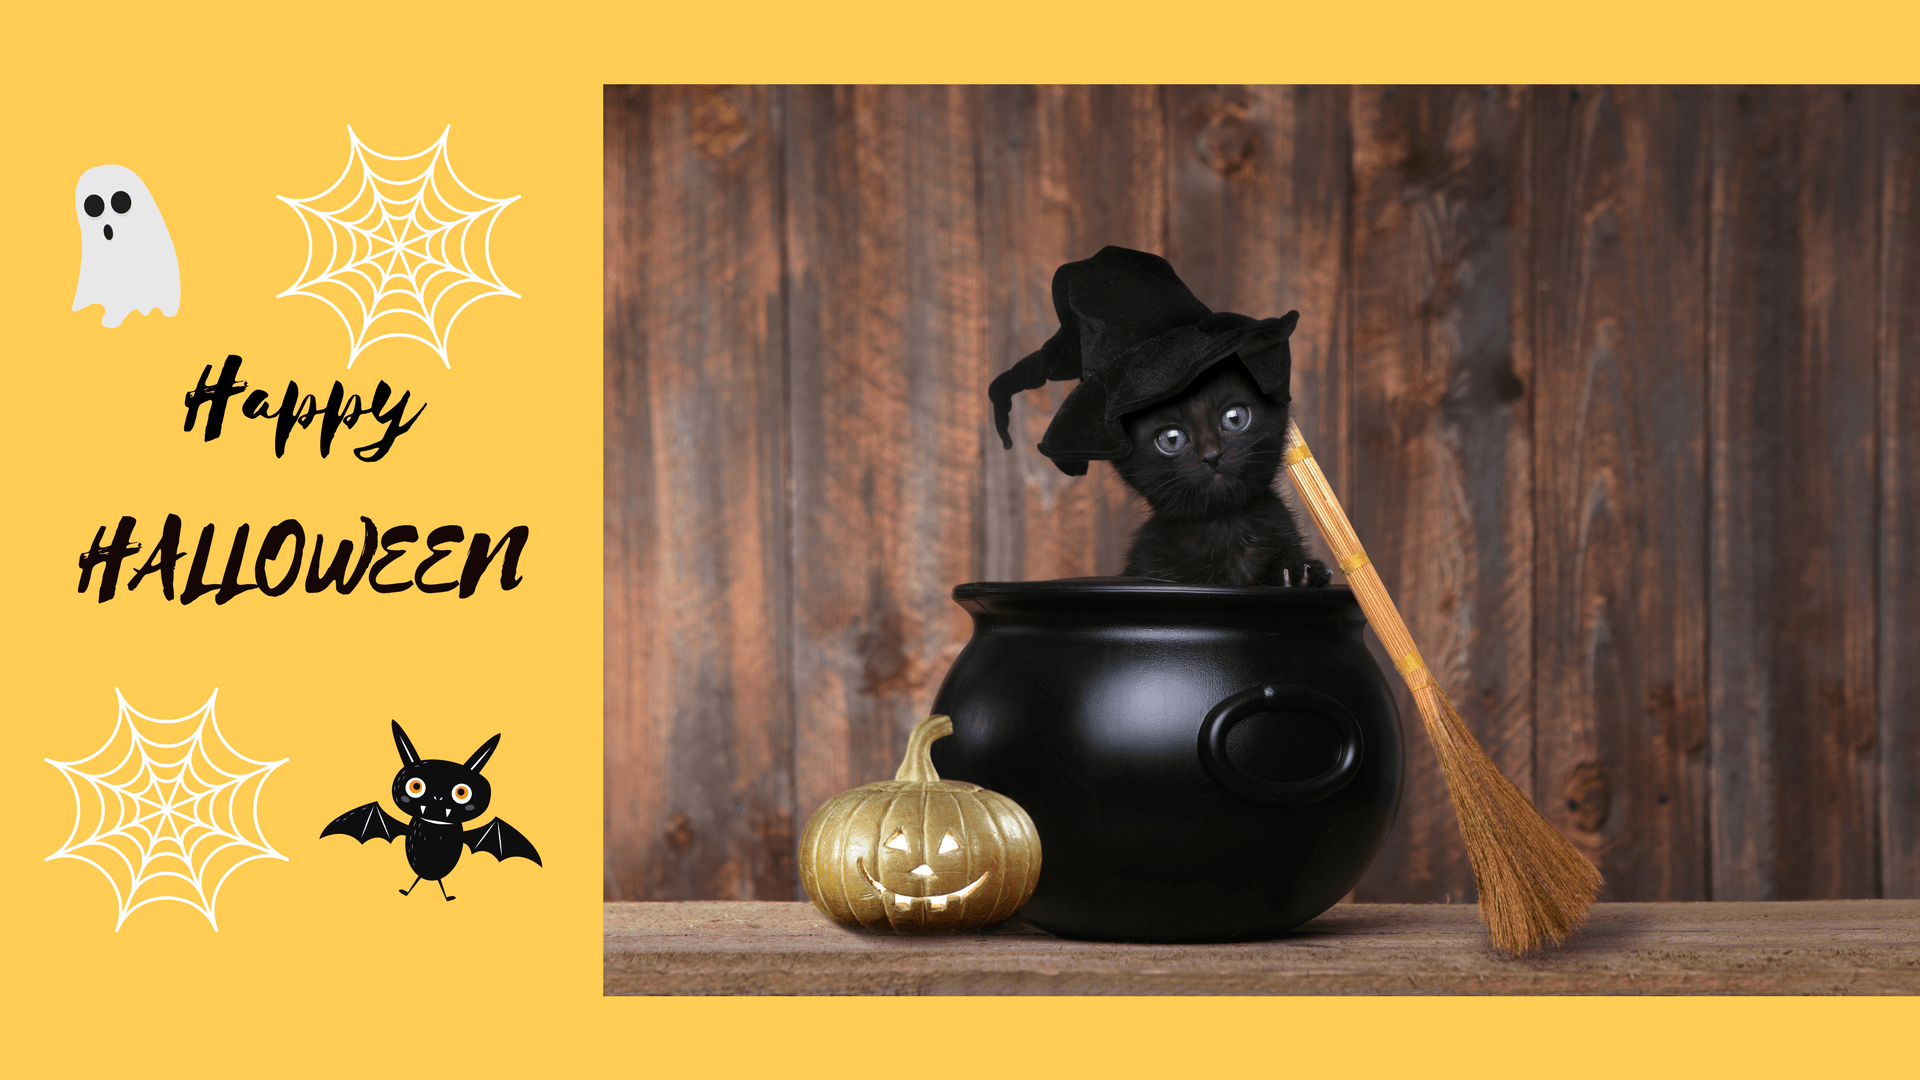 Happy Halloween 2(3)